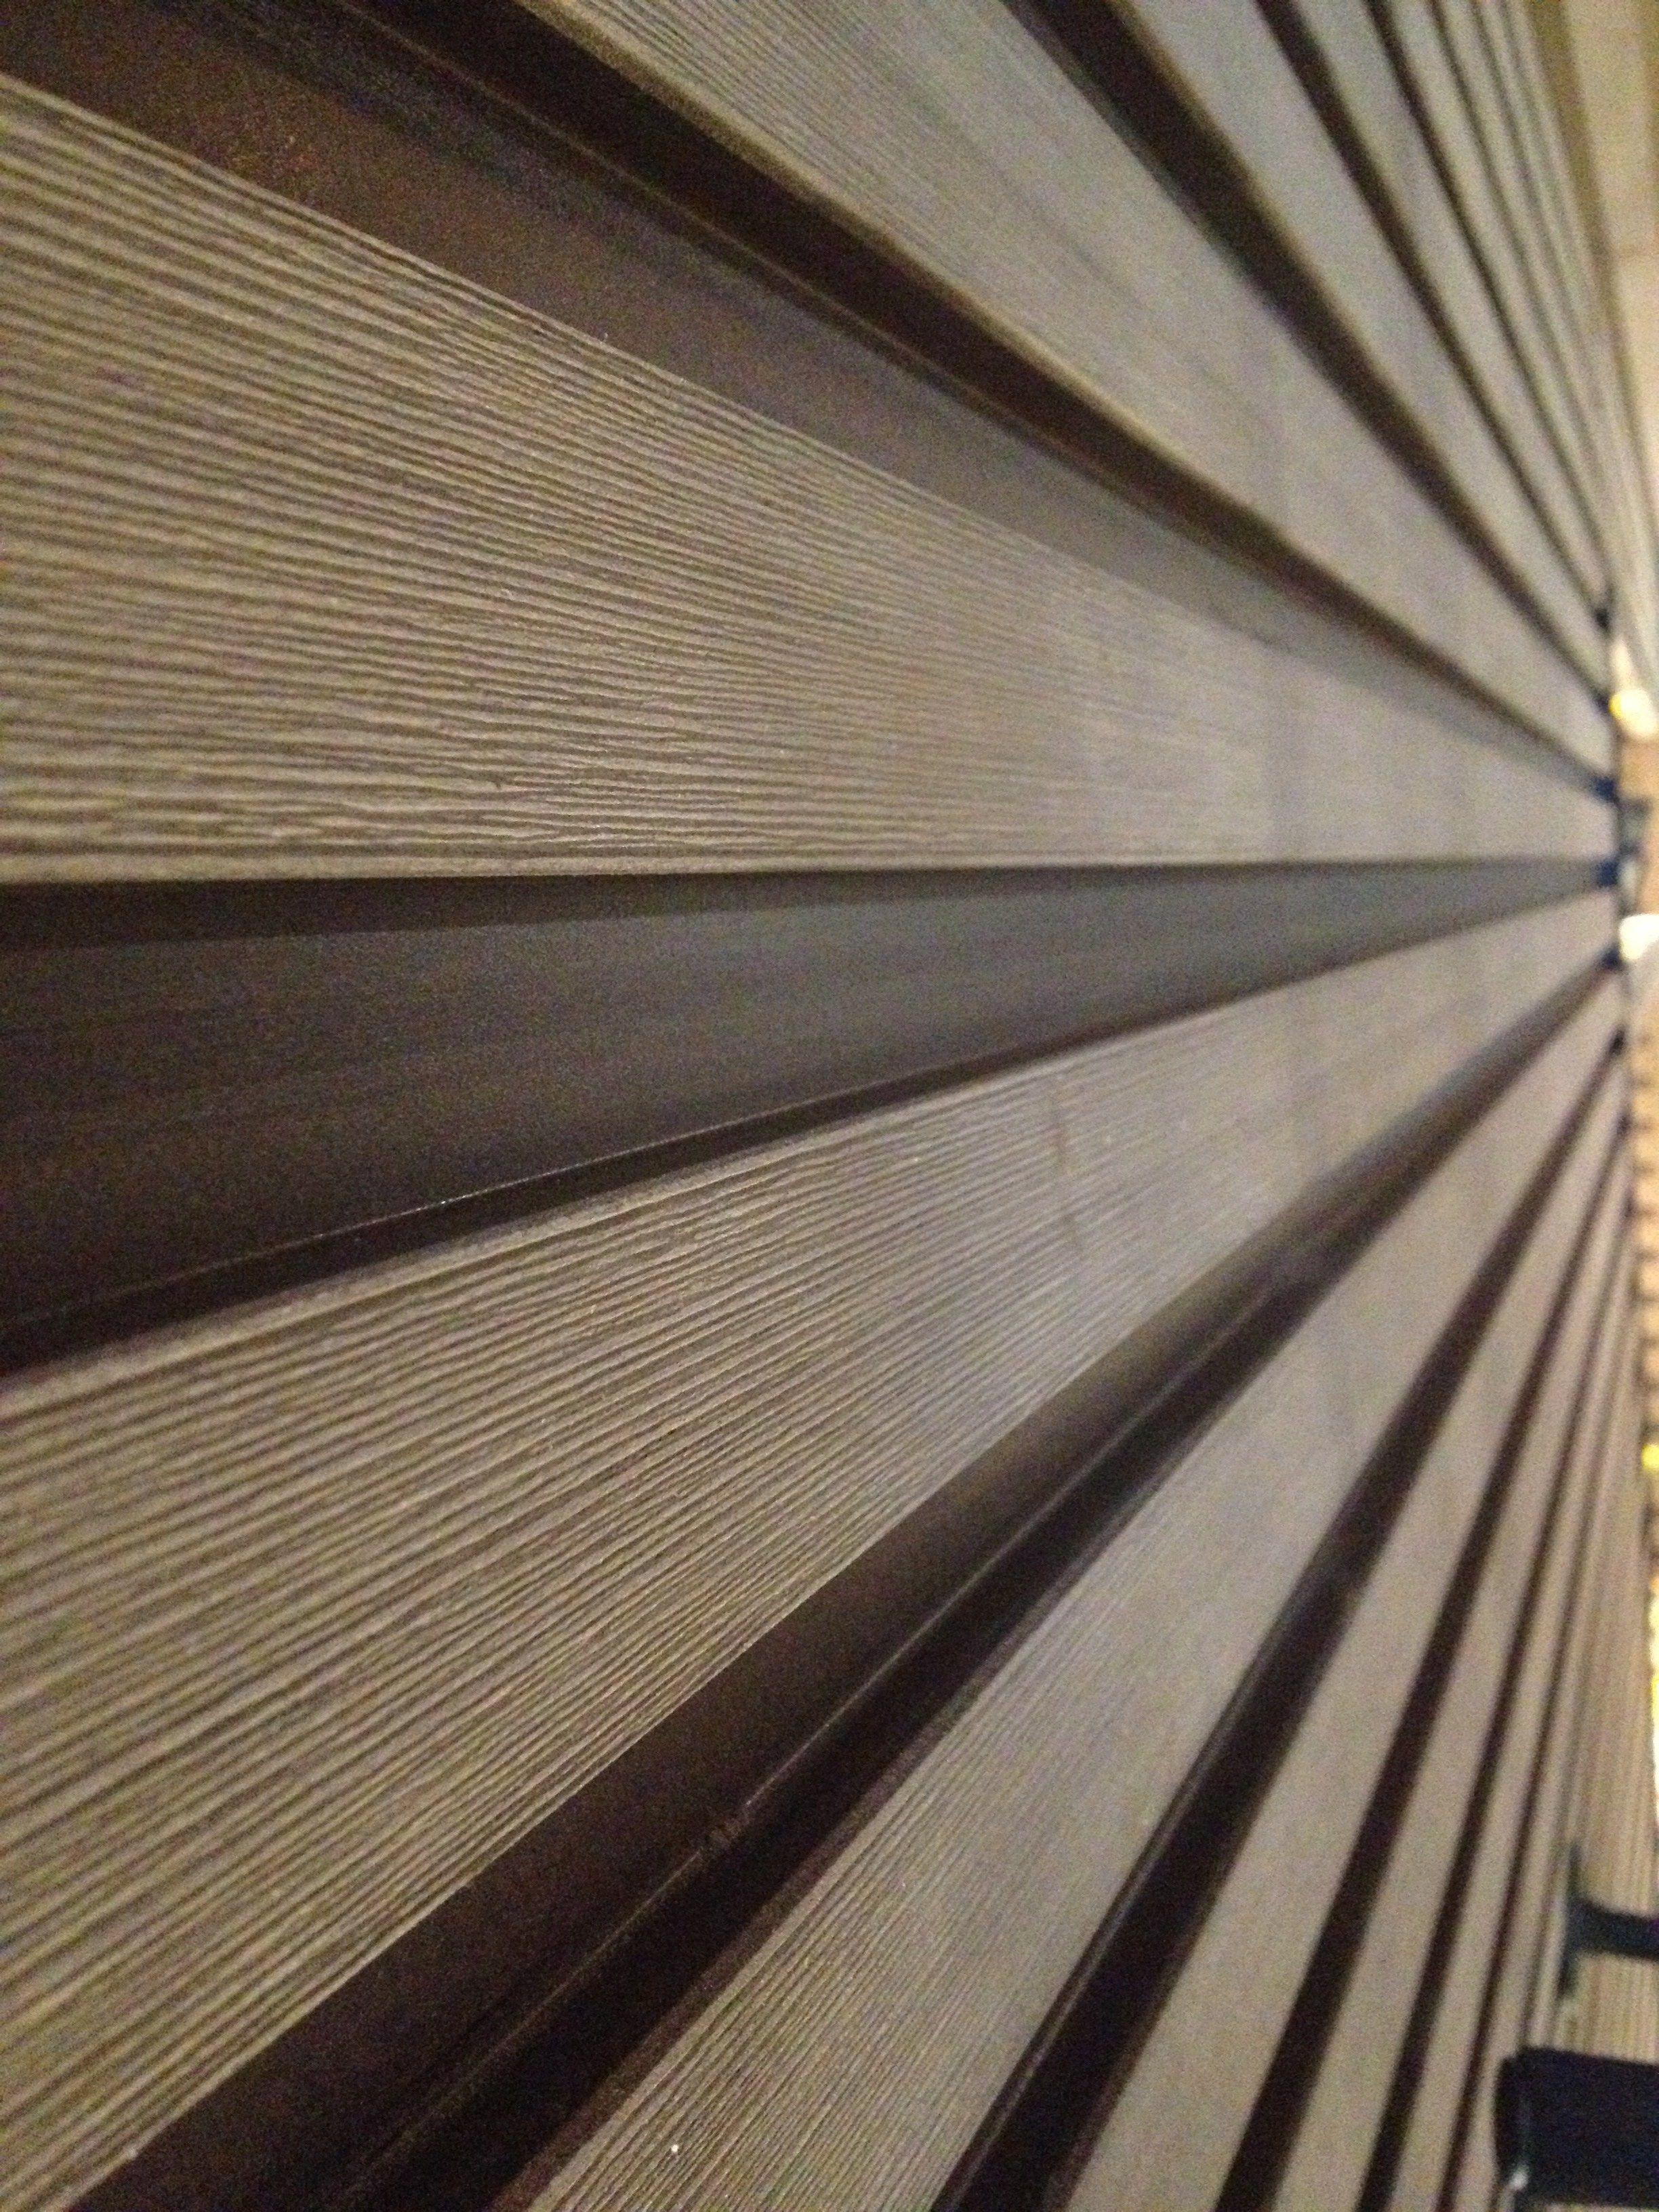 Rivestimenti per pareti interne MODULATUS INDOOR by WOODN INDUSTRIES